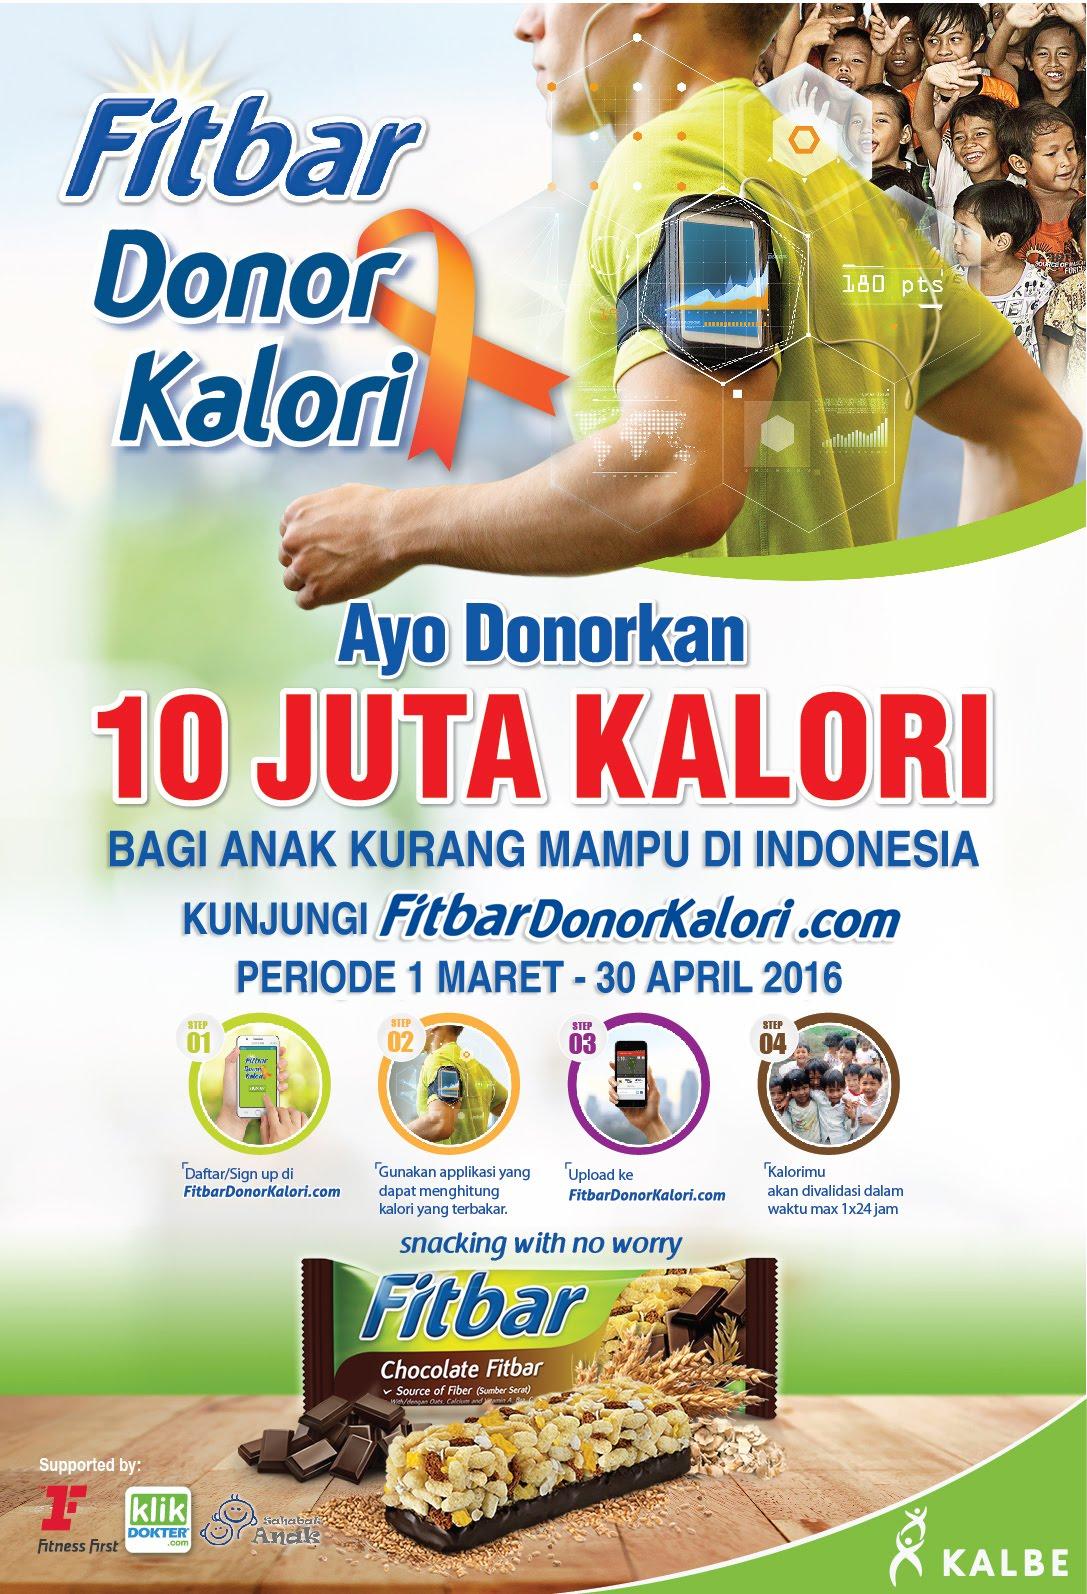 #FitbarDonorKalori